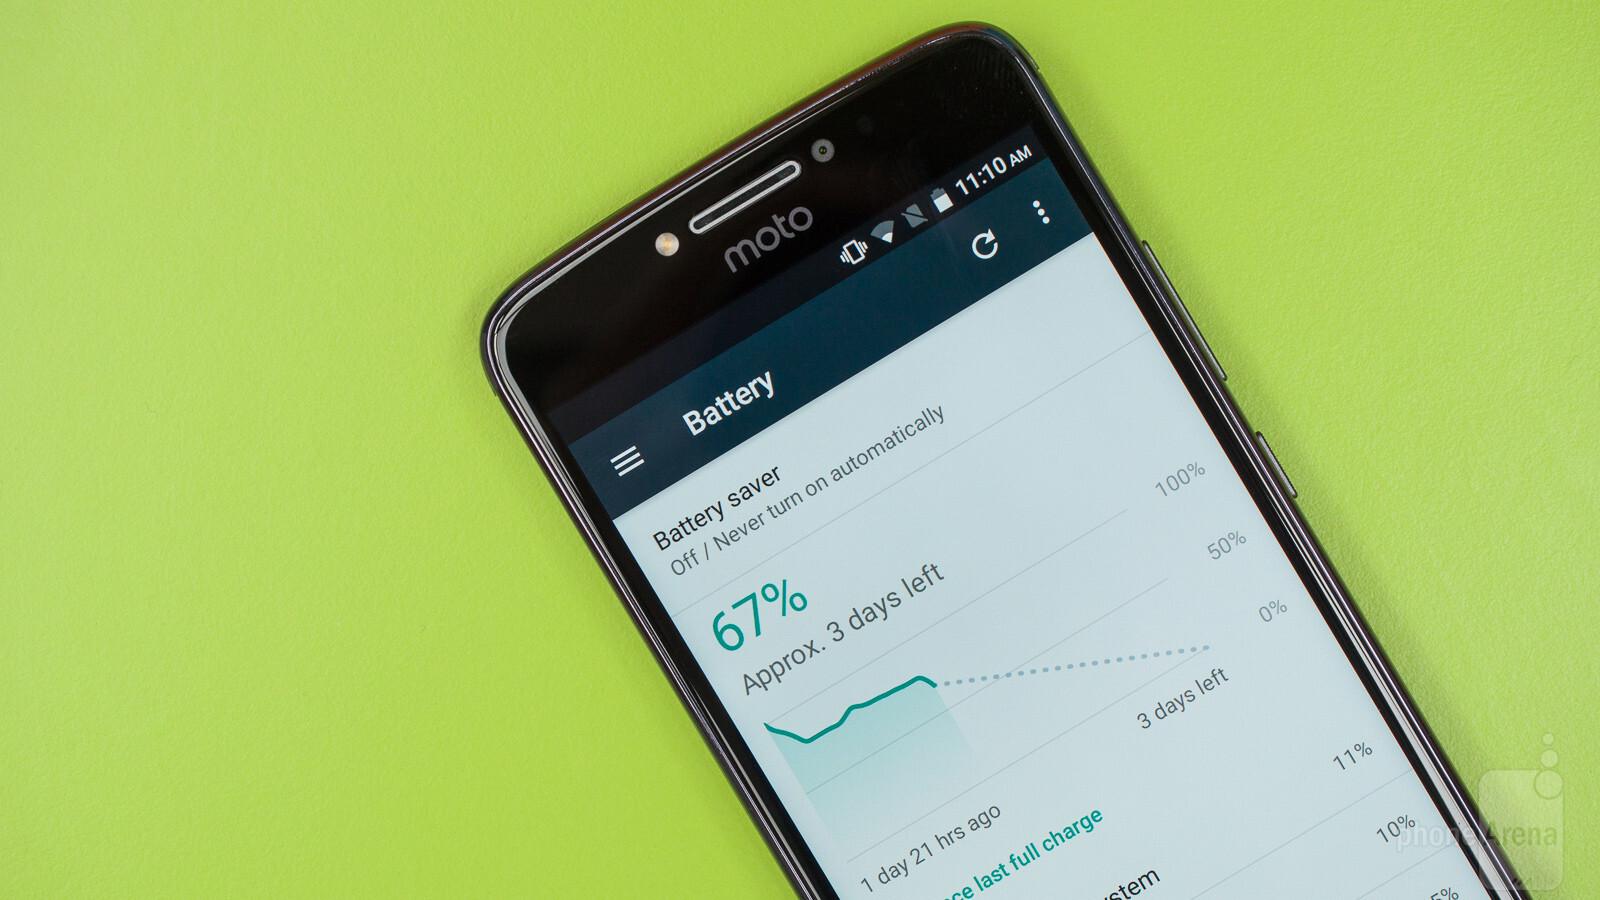 Motorola Moto E4 Plus Review - Call quality, Battery life